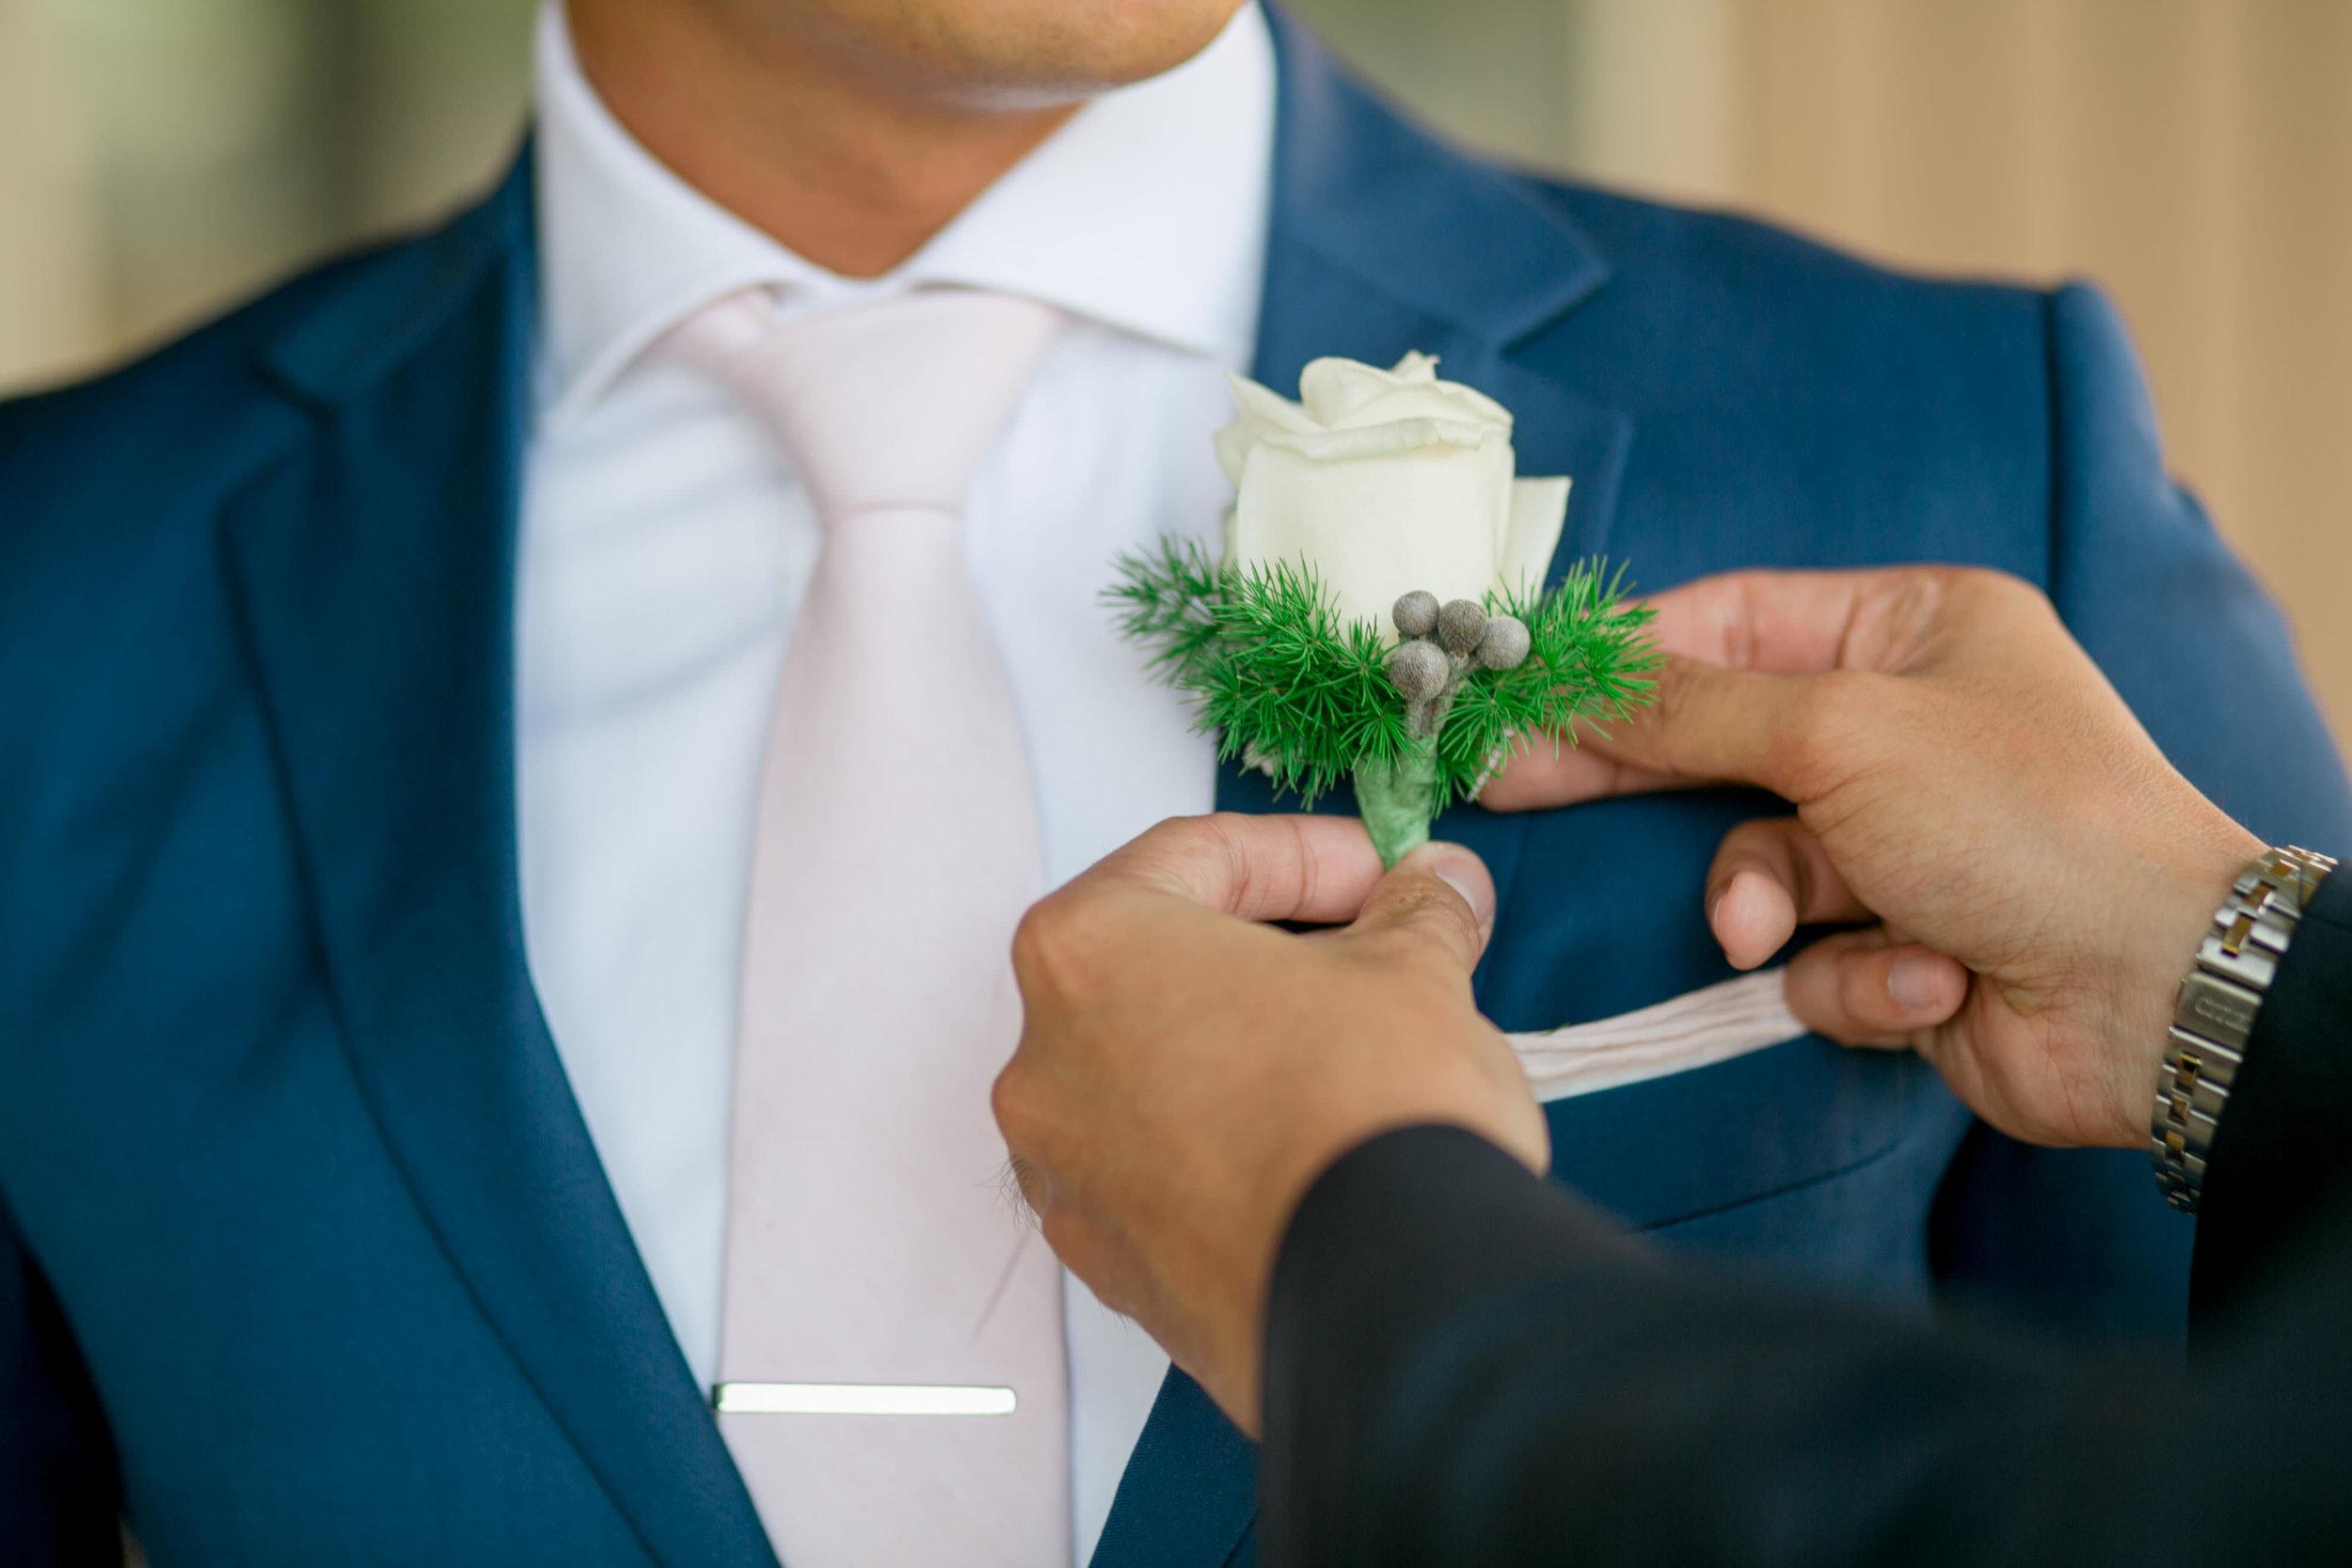 Stefanie___Bernard___Daniel_Ricci_Weddings_High_Res._Finals__068.jpg